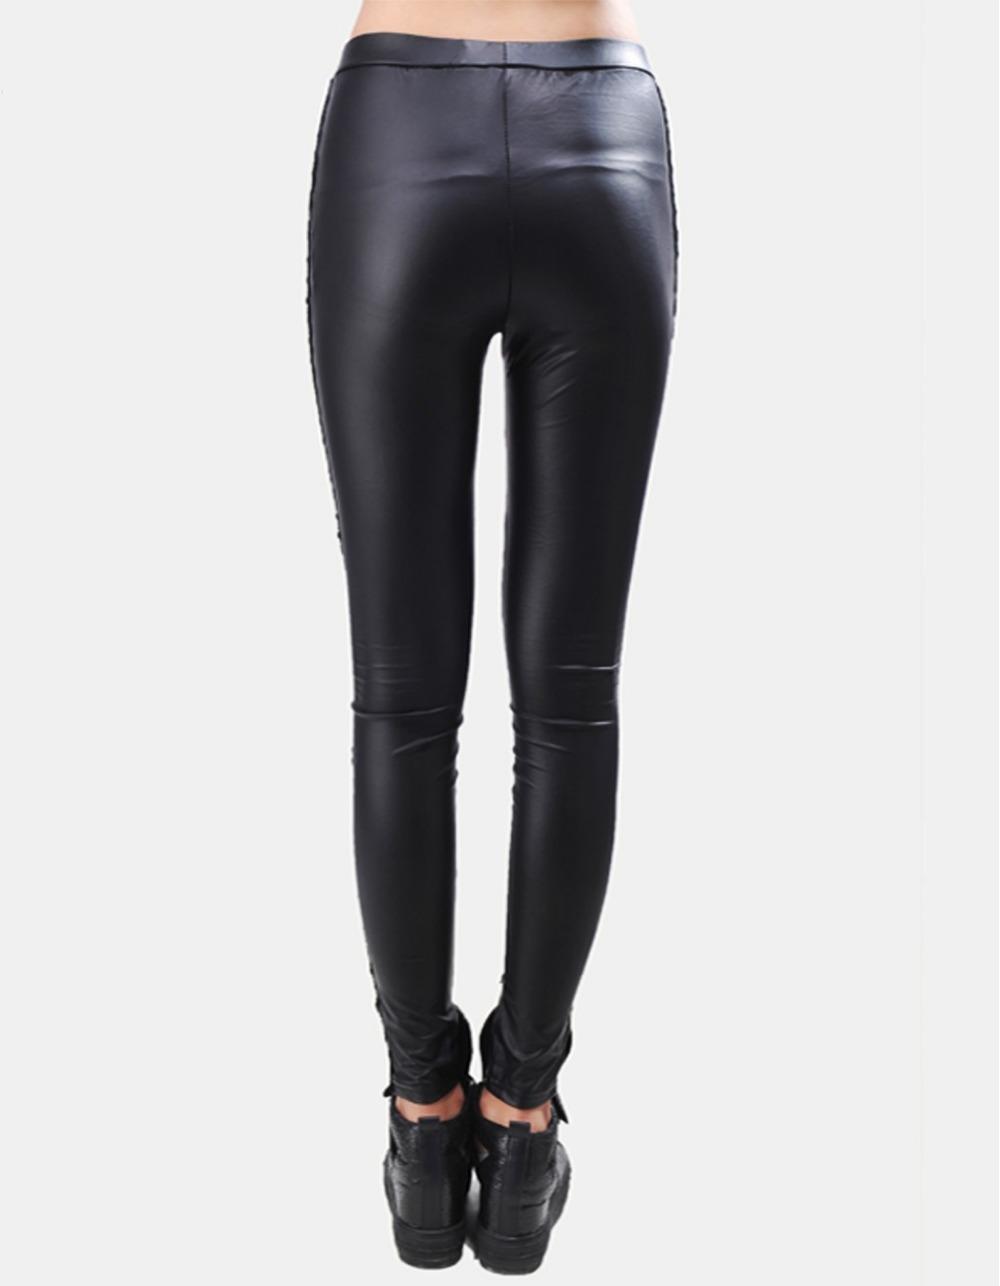 Black Legins Punk Gothic Fashion Women Leggings Sexy PU Leather Stitching Embroidery Hollow Lace Legging For Women Leggins 15 6